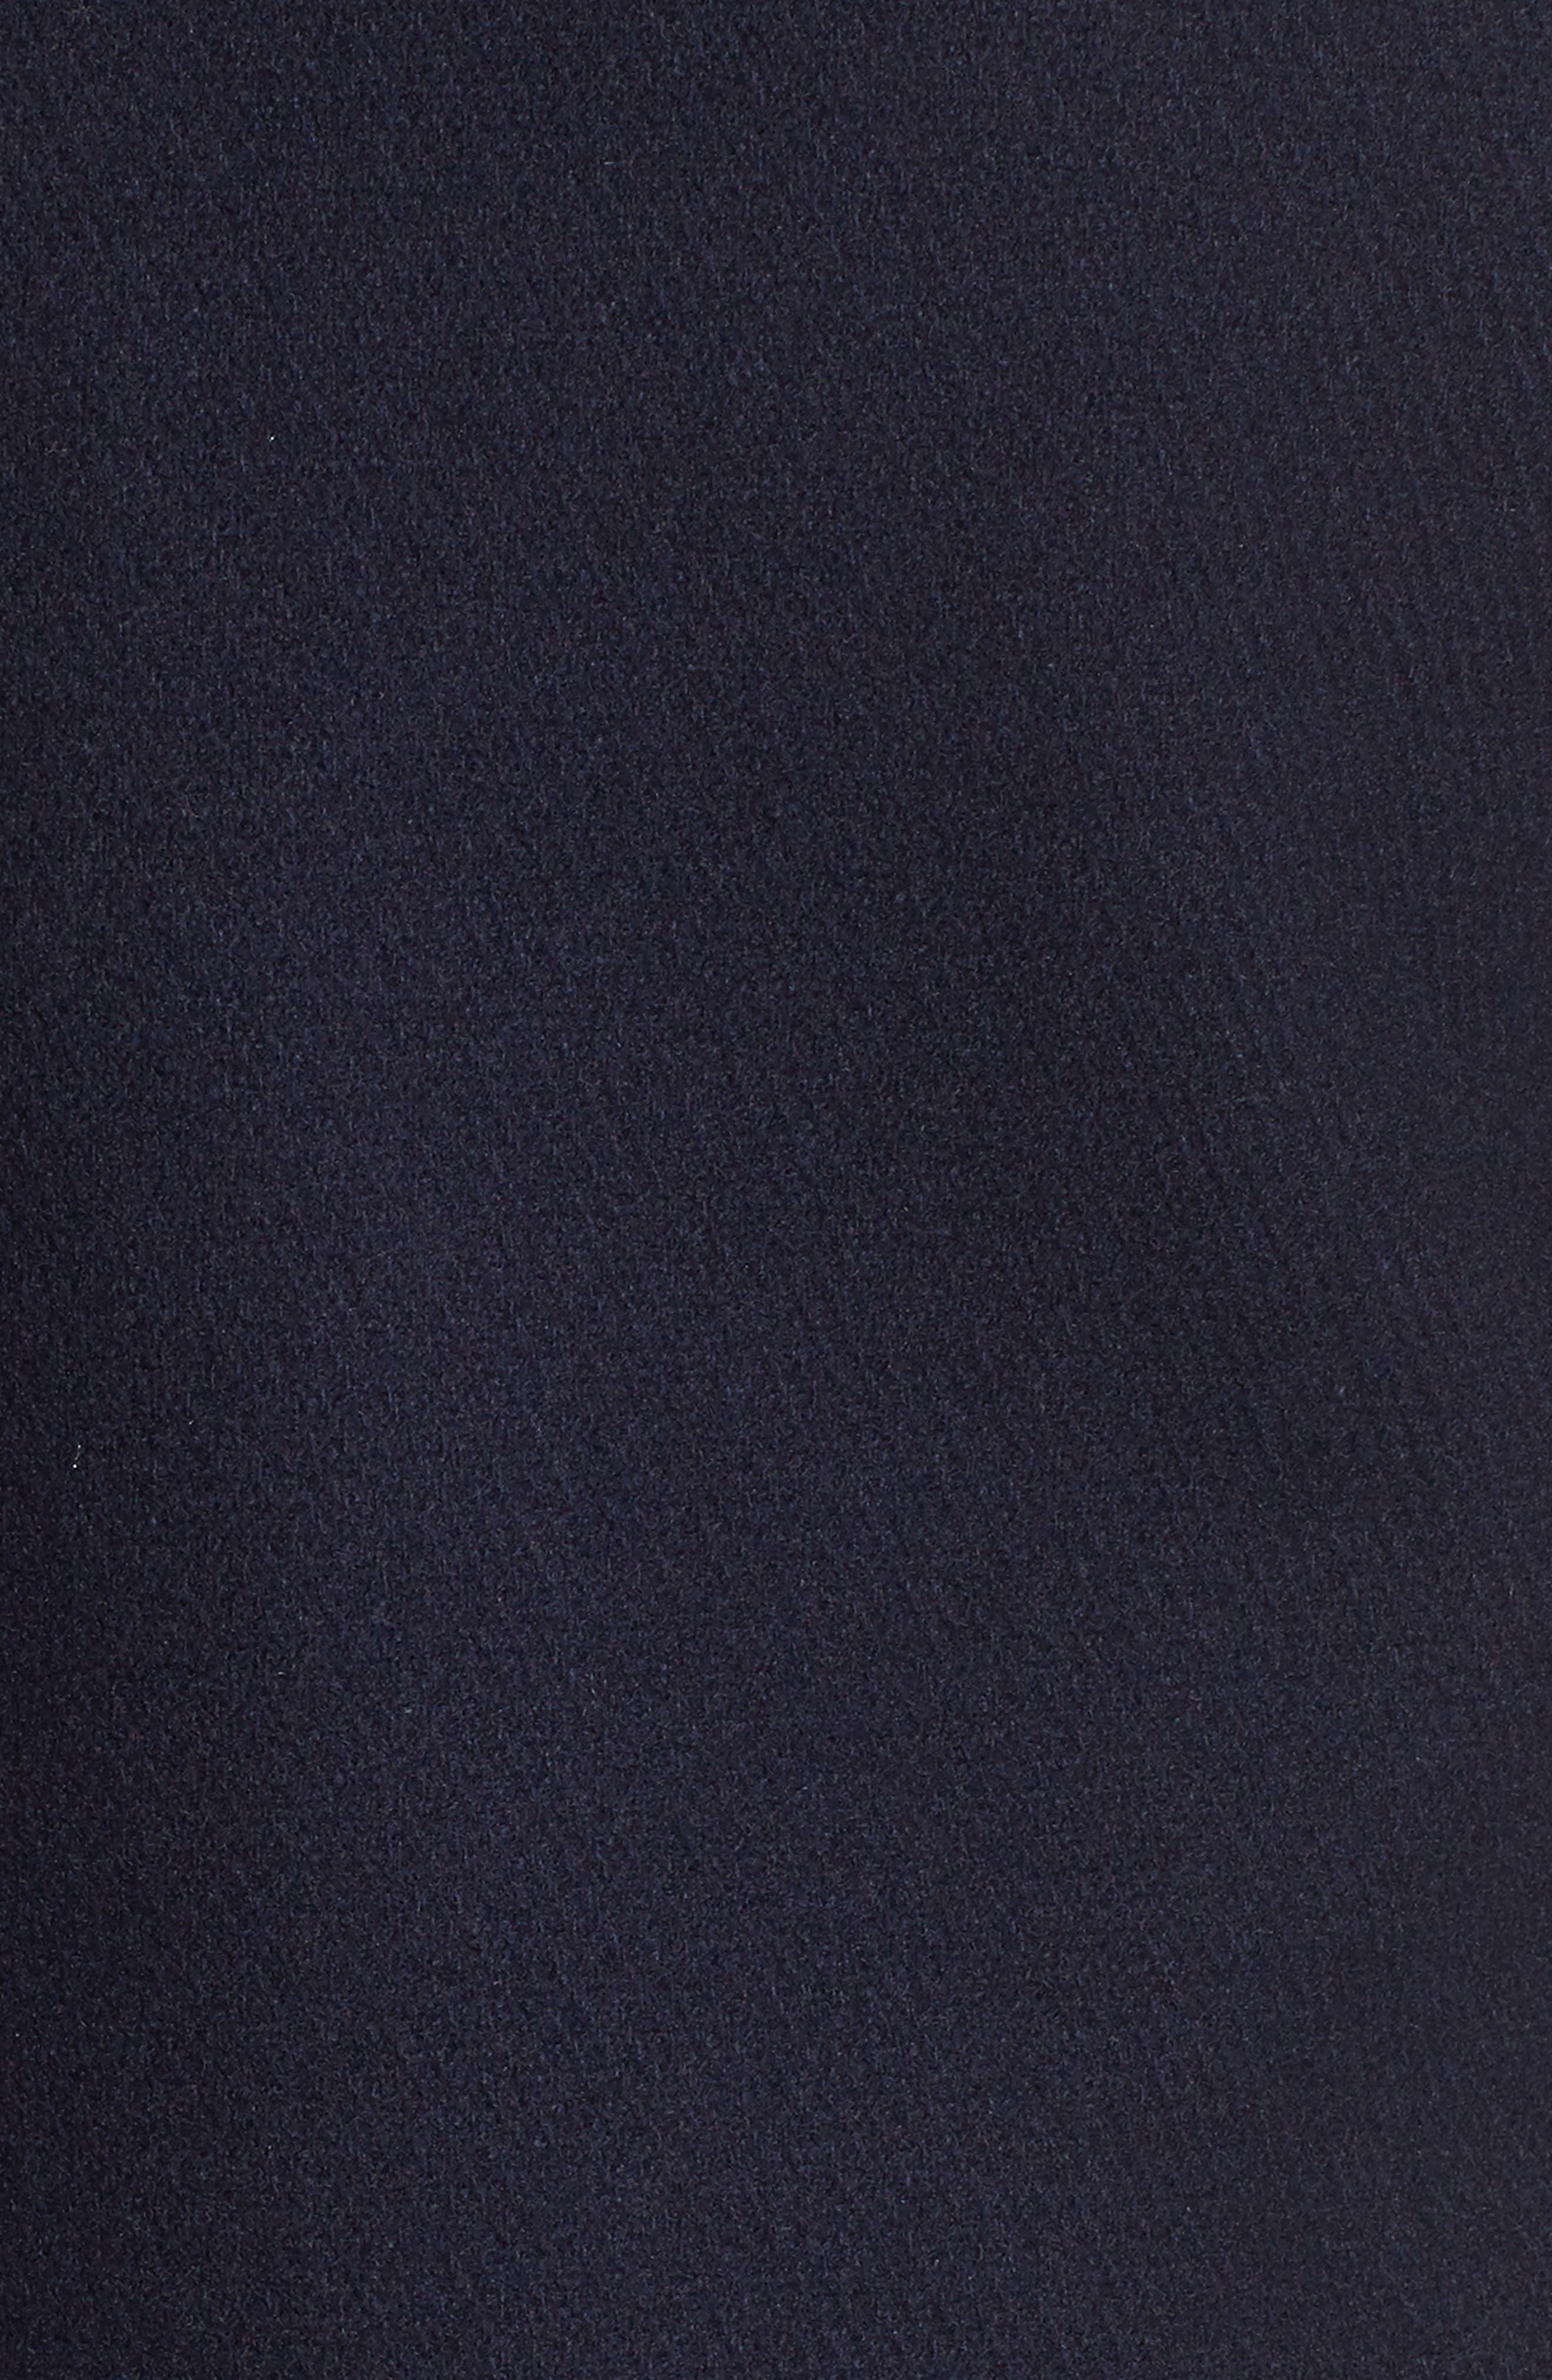 Wool Blend Peacoat,                             Alternate thumbnail 4, color,                             400